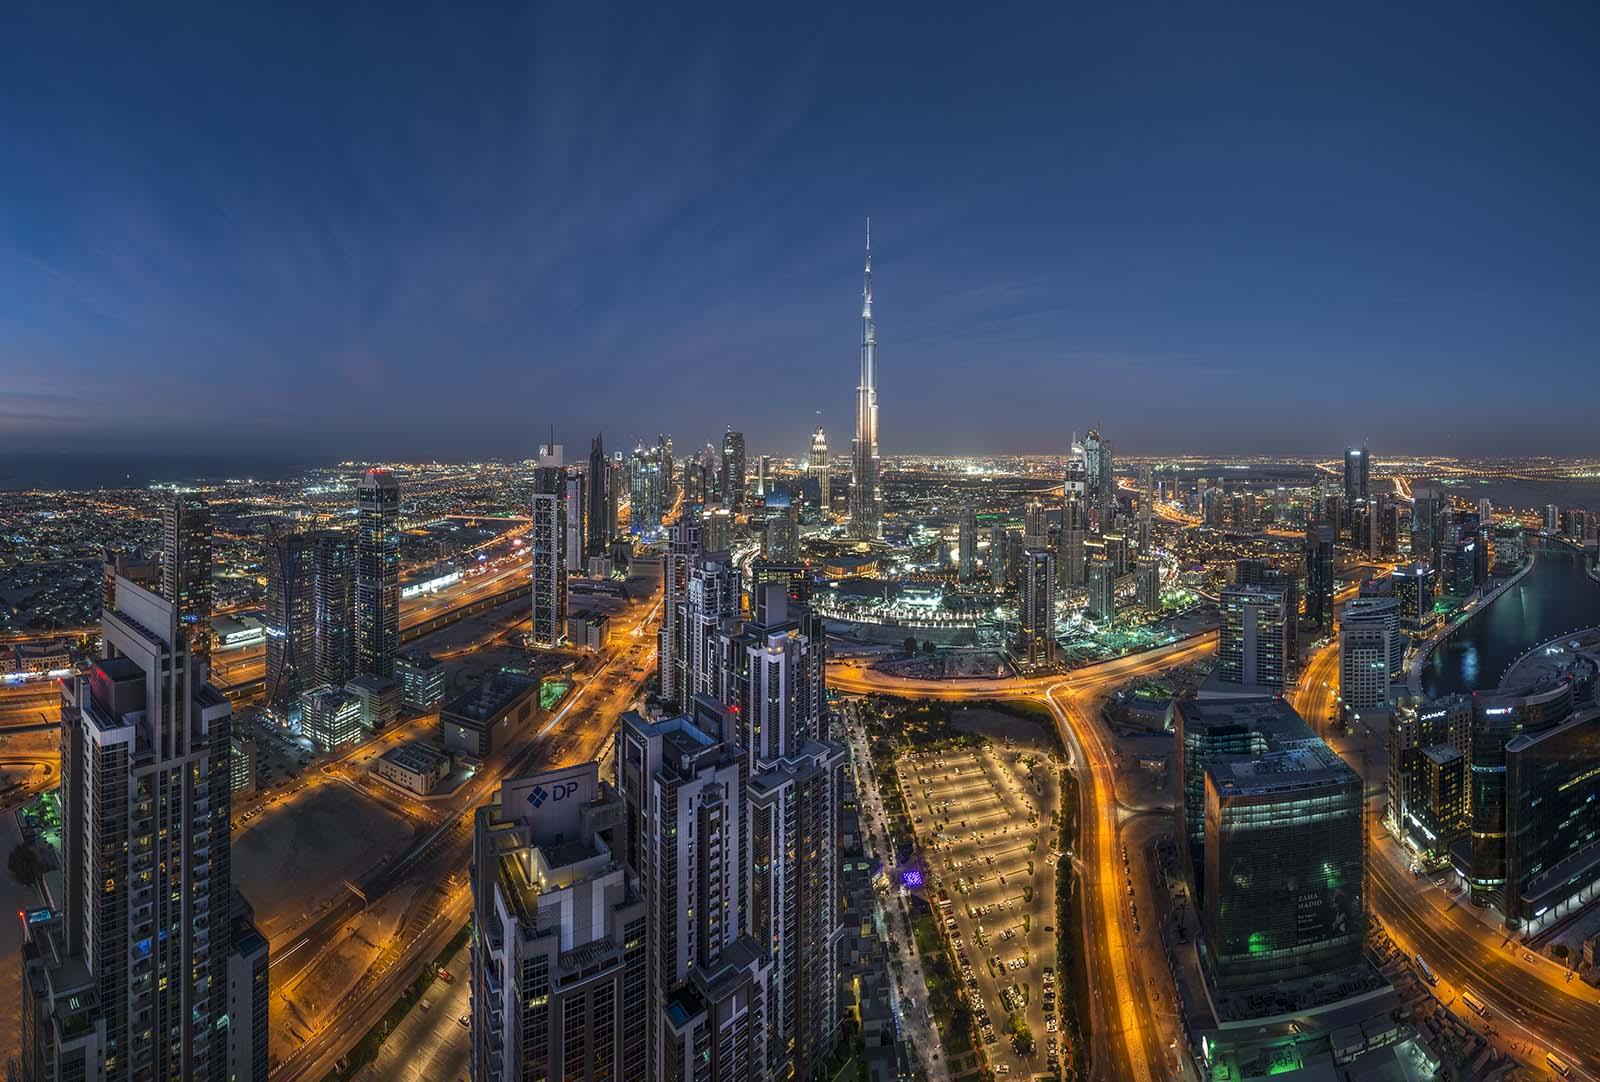 The Downtown Dubai